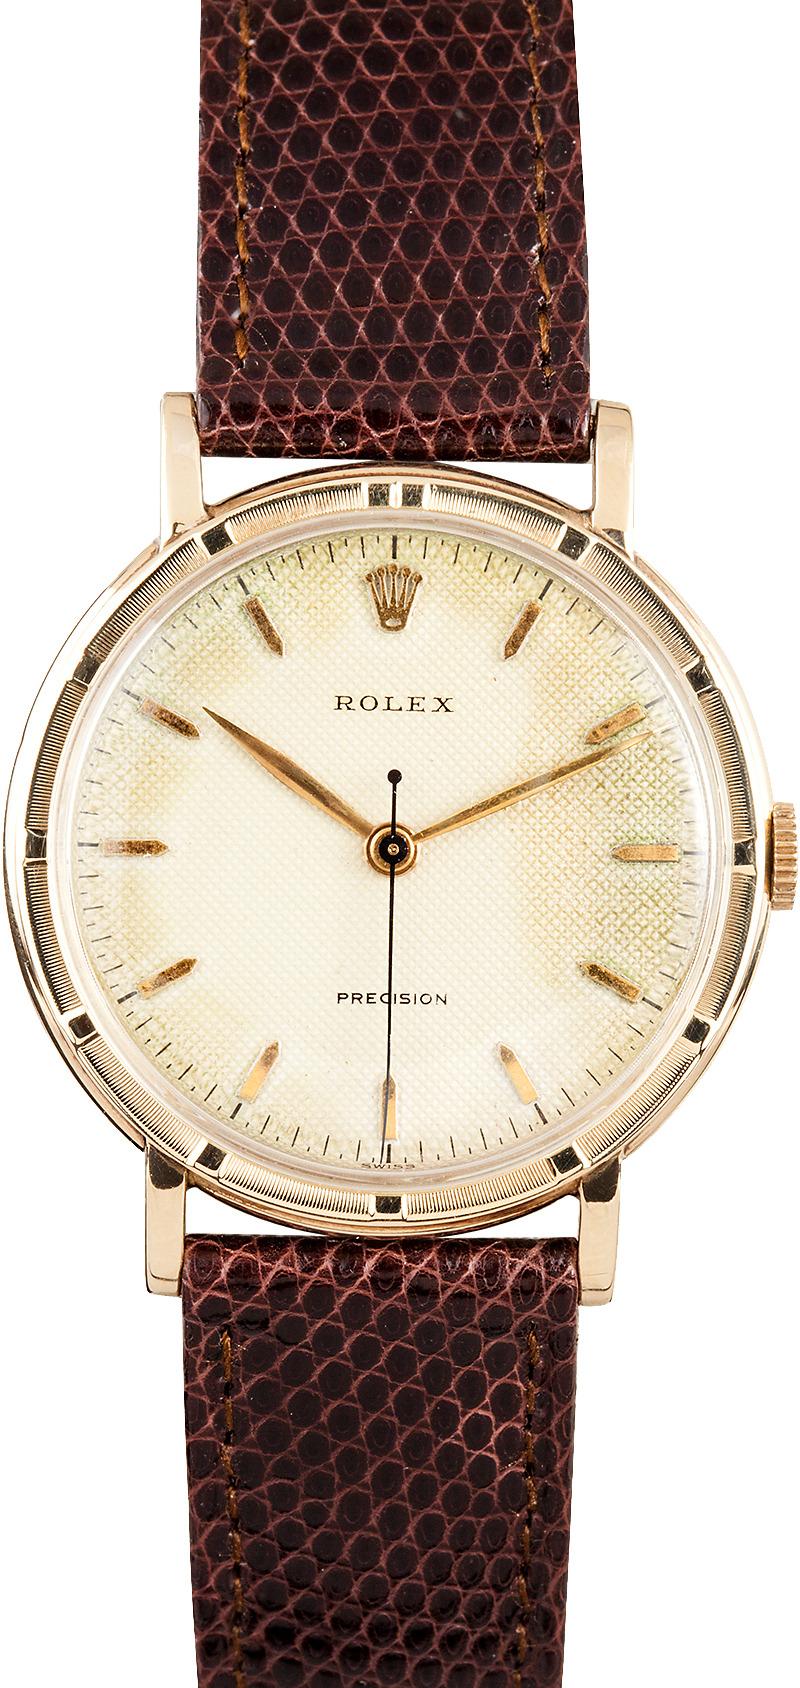 vintage rolex dress watch at bob 39 s watches 100 rolex. Black Bedroom Furniture Sets. Home Design Ideas